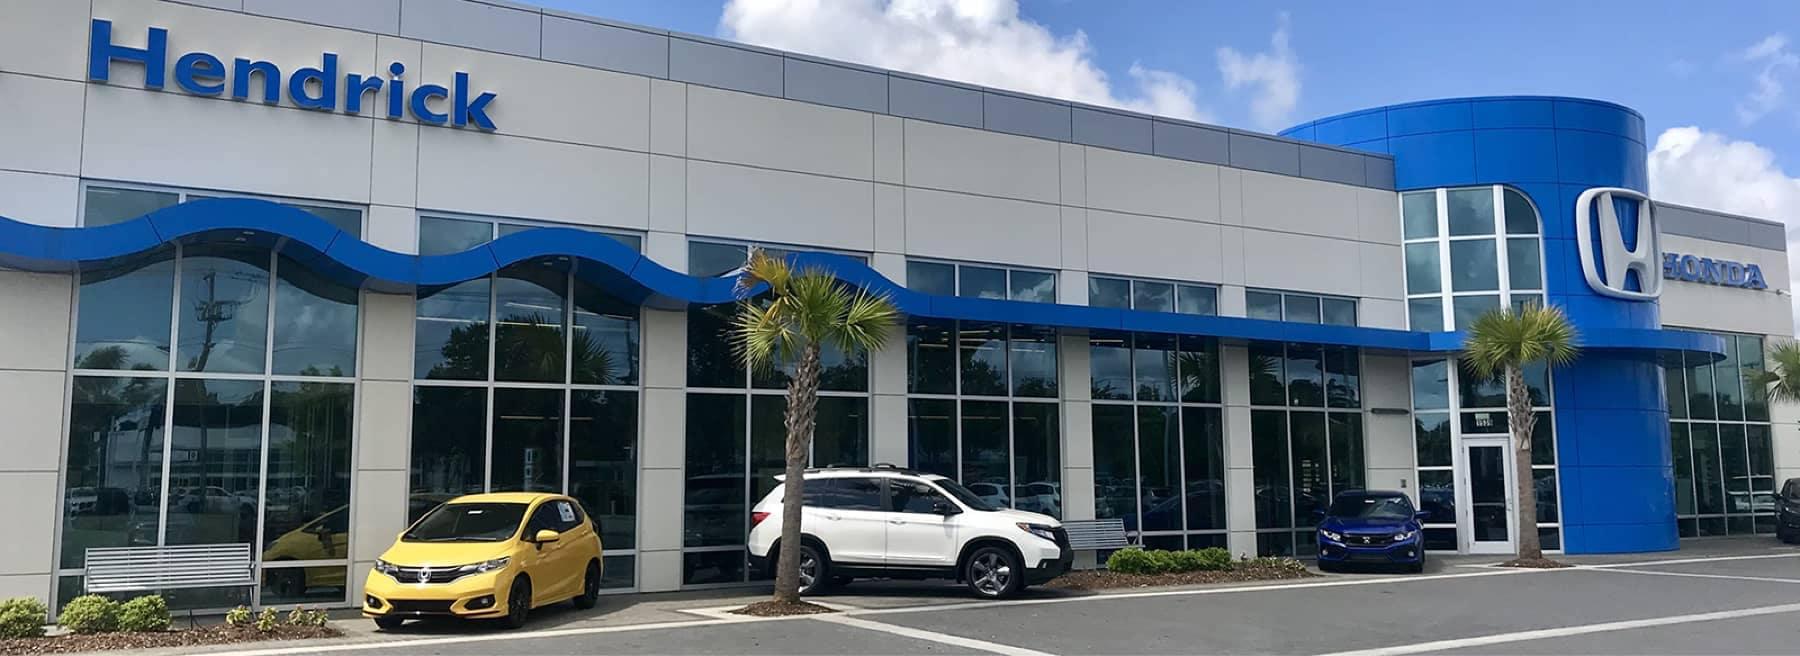 Hendrick Honda of Charleston - exterior of dealership